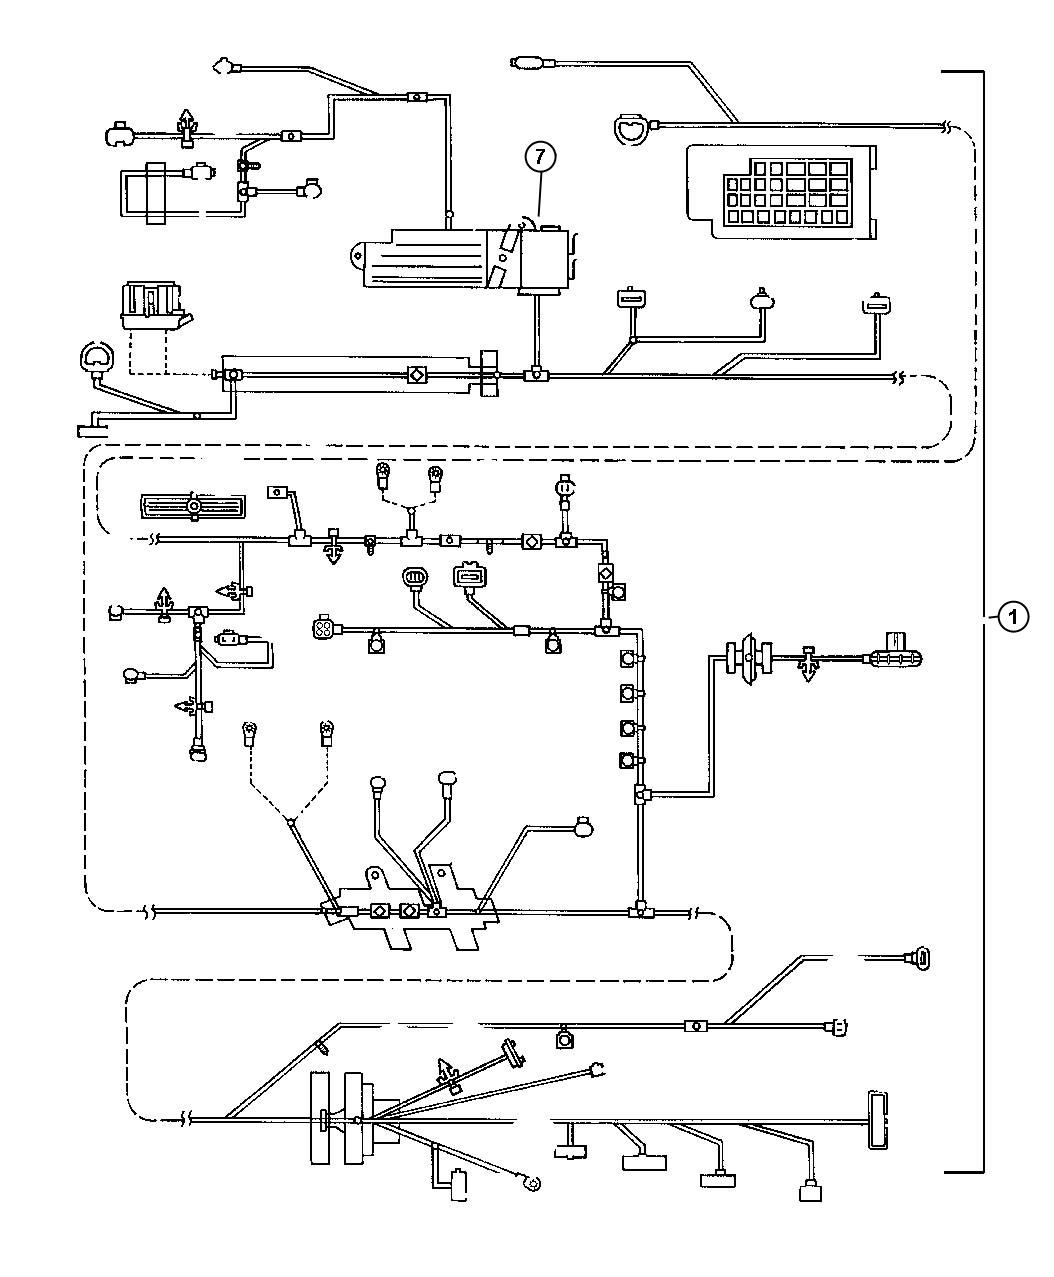 hight resolution of 02 dodge stratus 2 7 engine 05 dodge stratus fuse diagram dodge stratus wiring diagram dodge